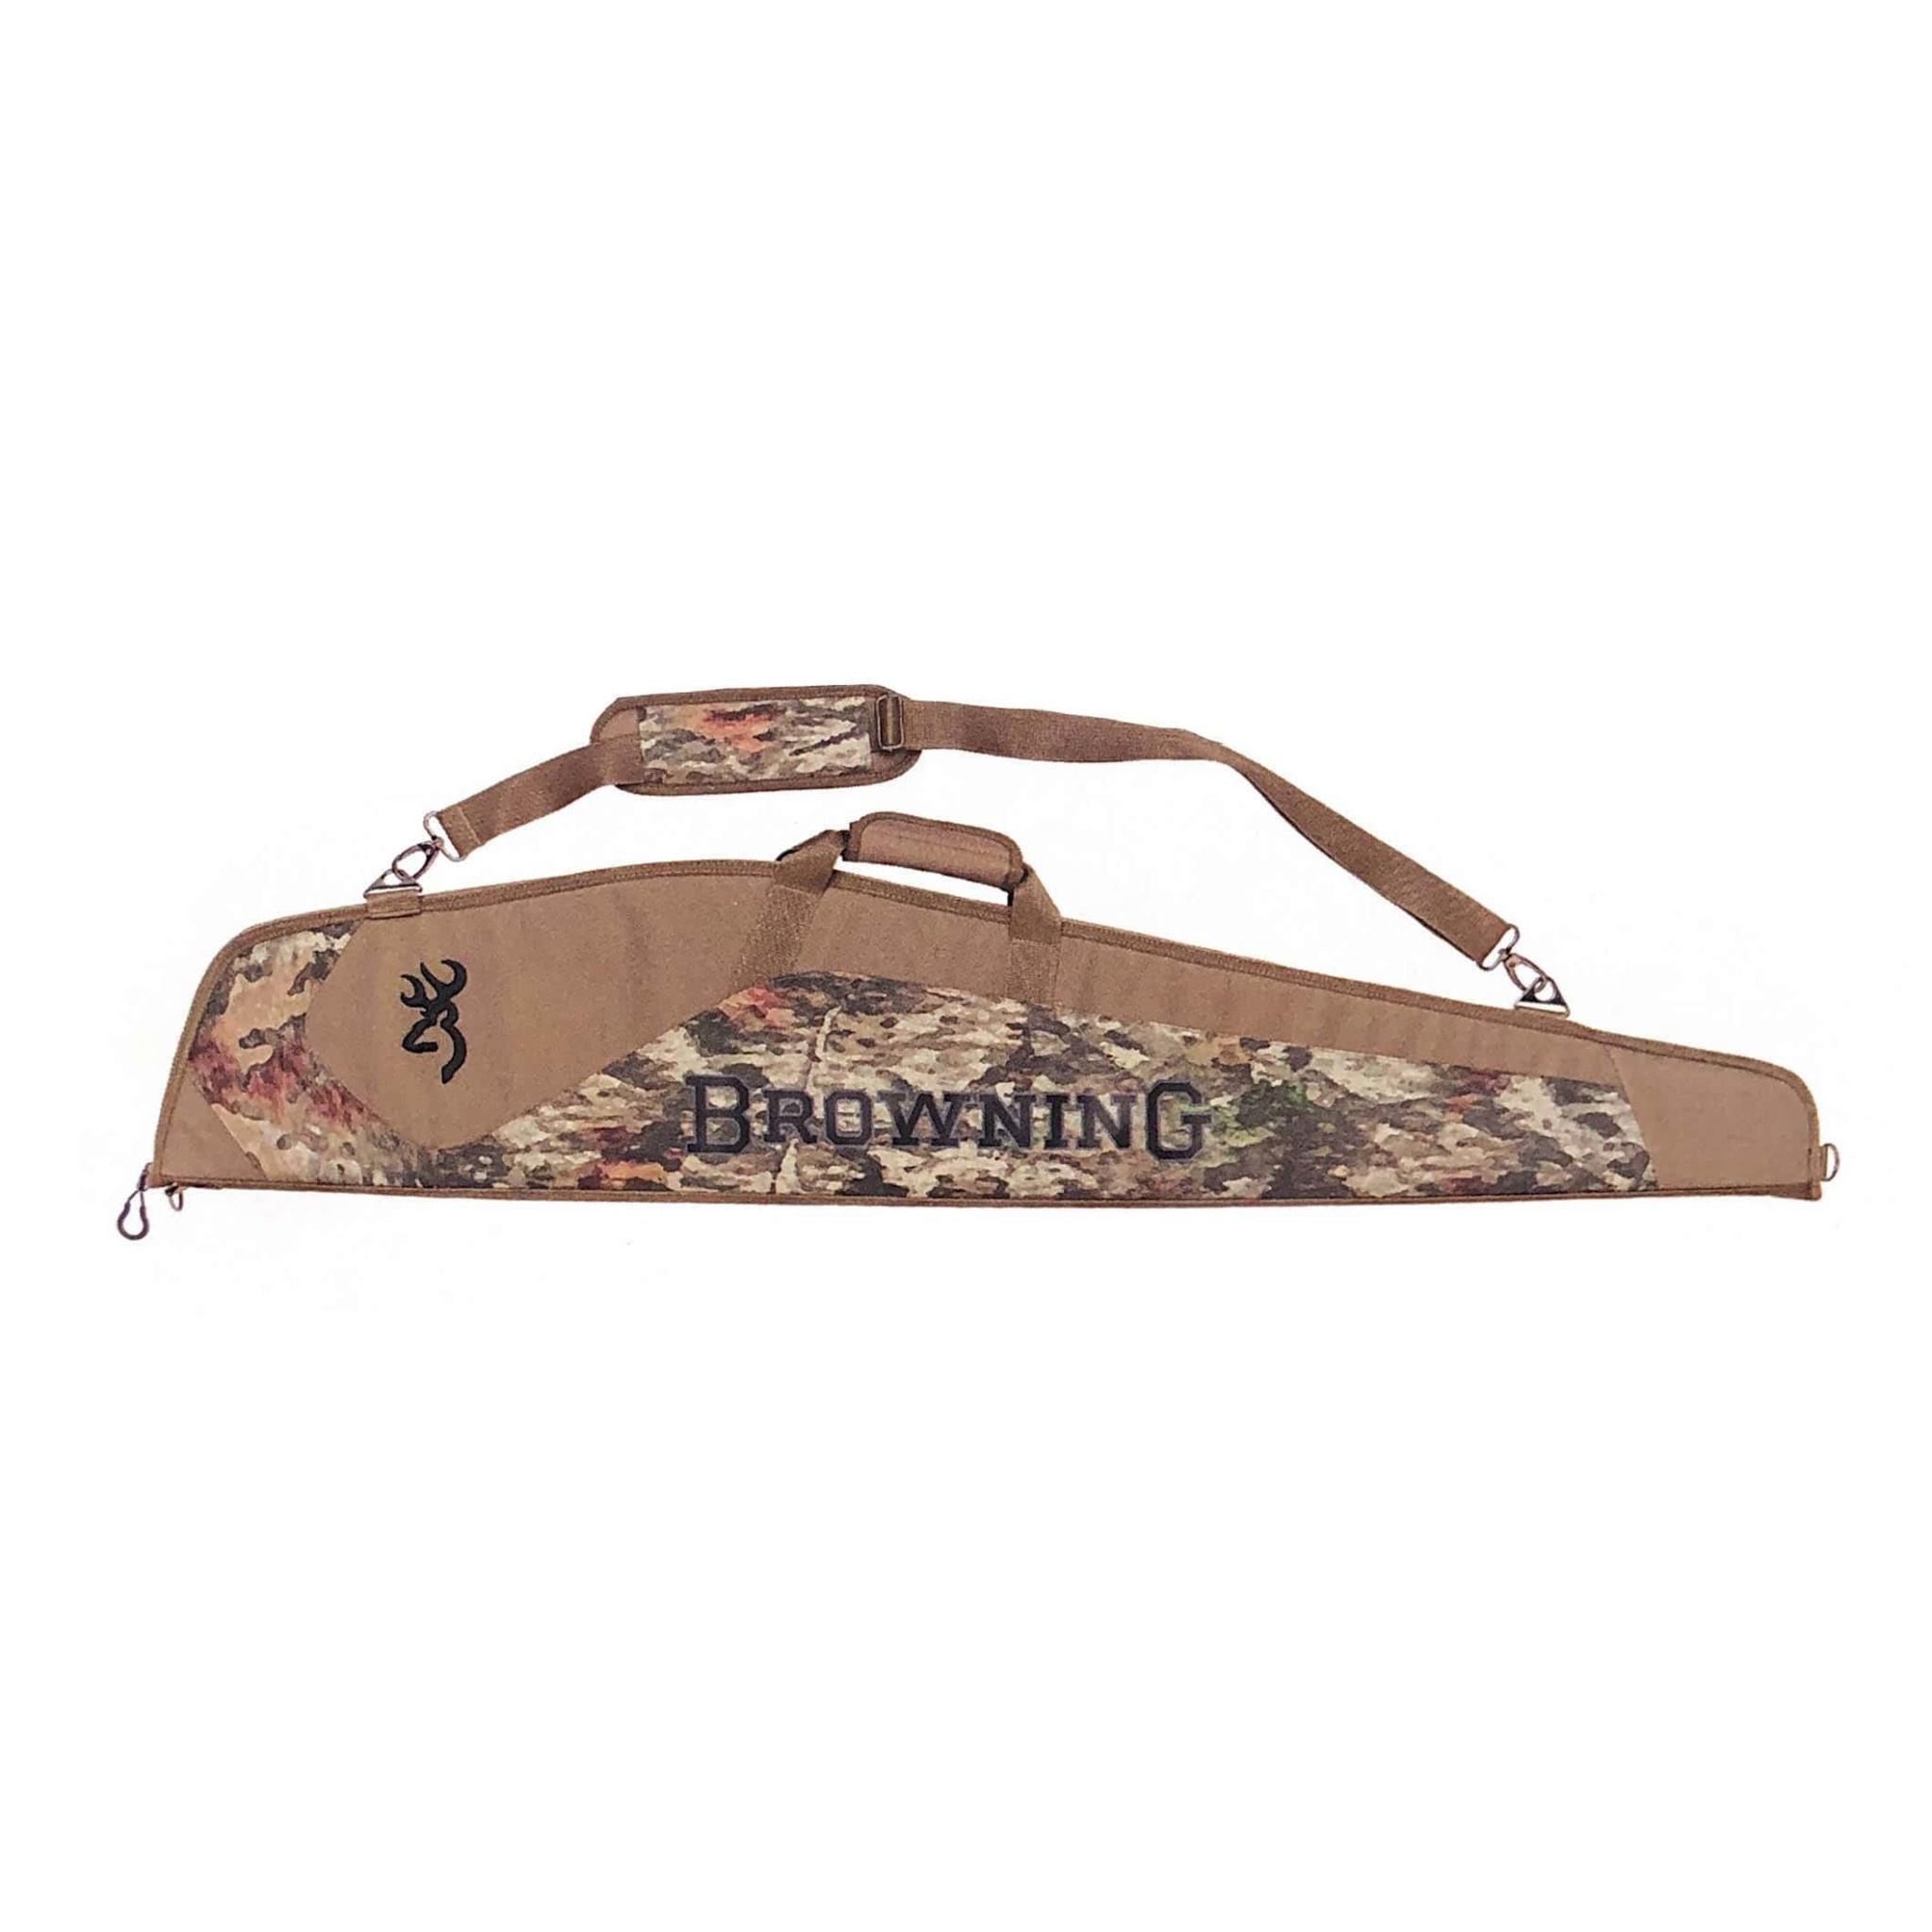 Browning Flex Rifle Case Grapple AU